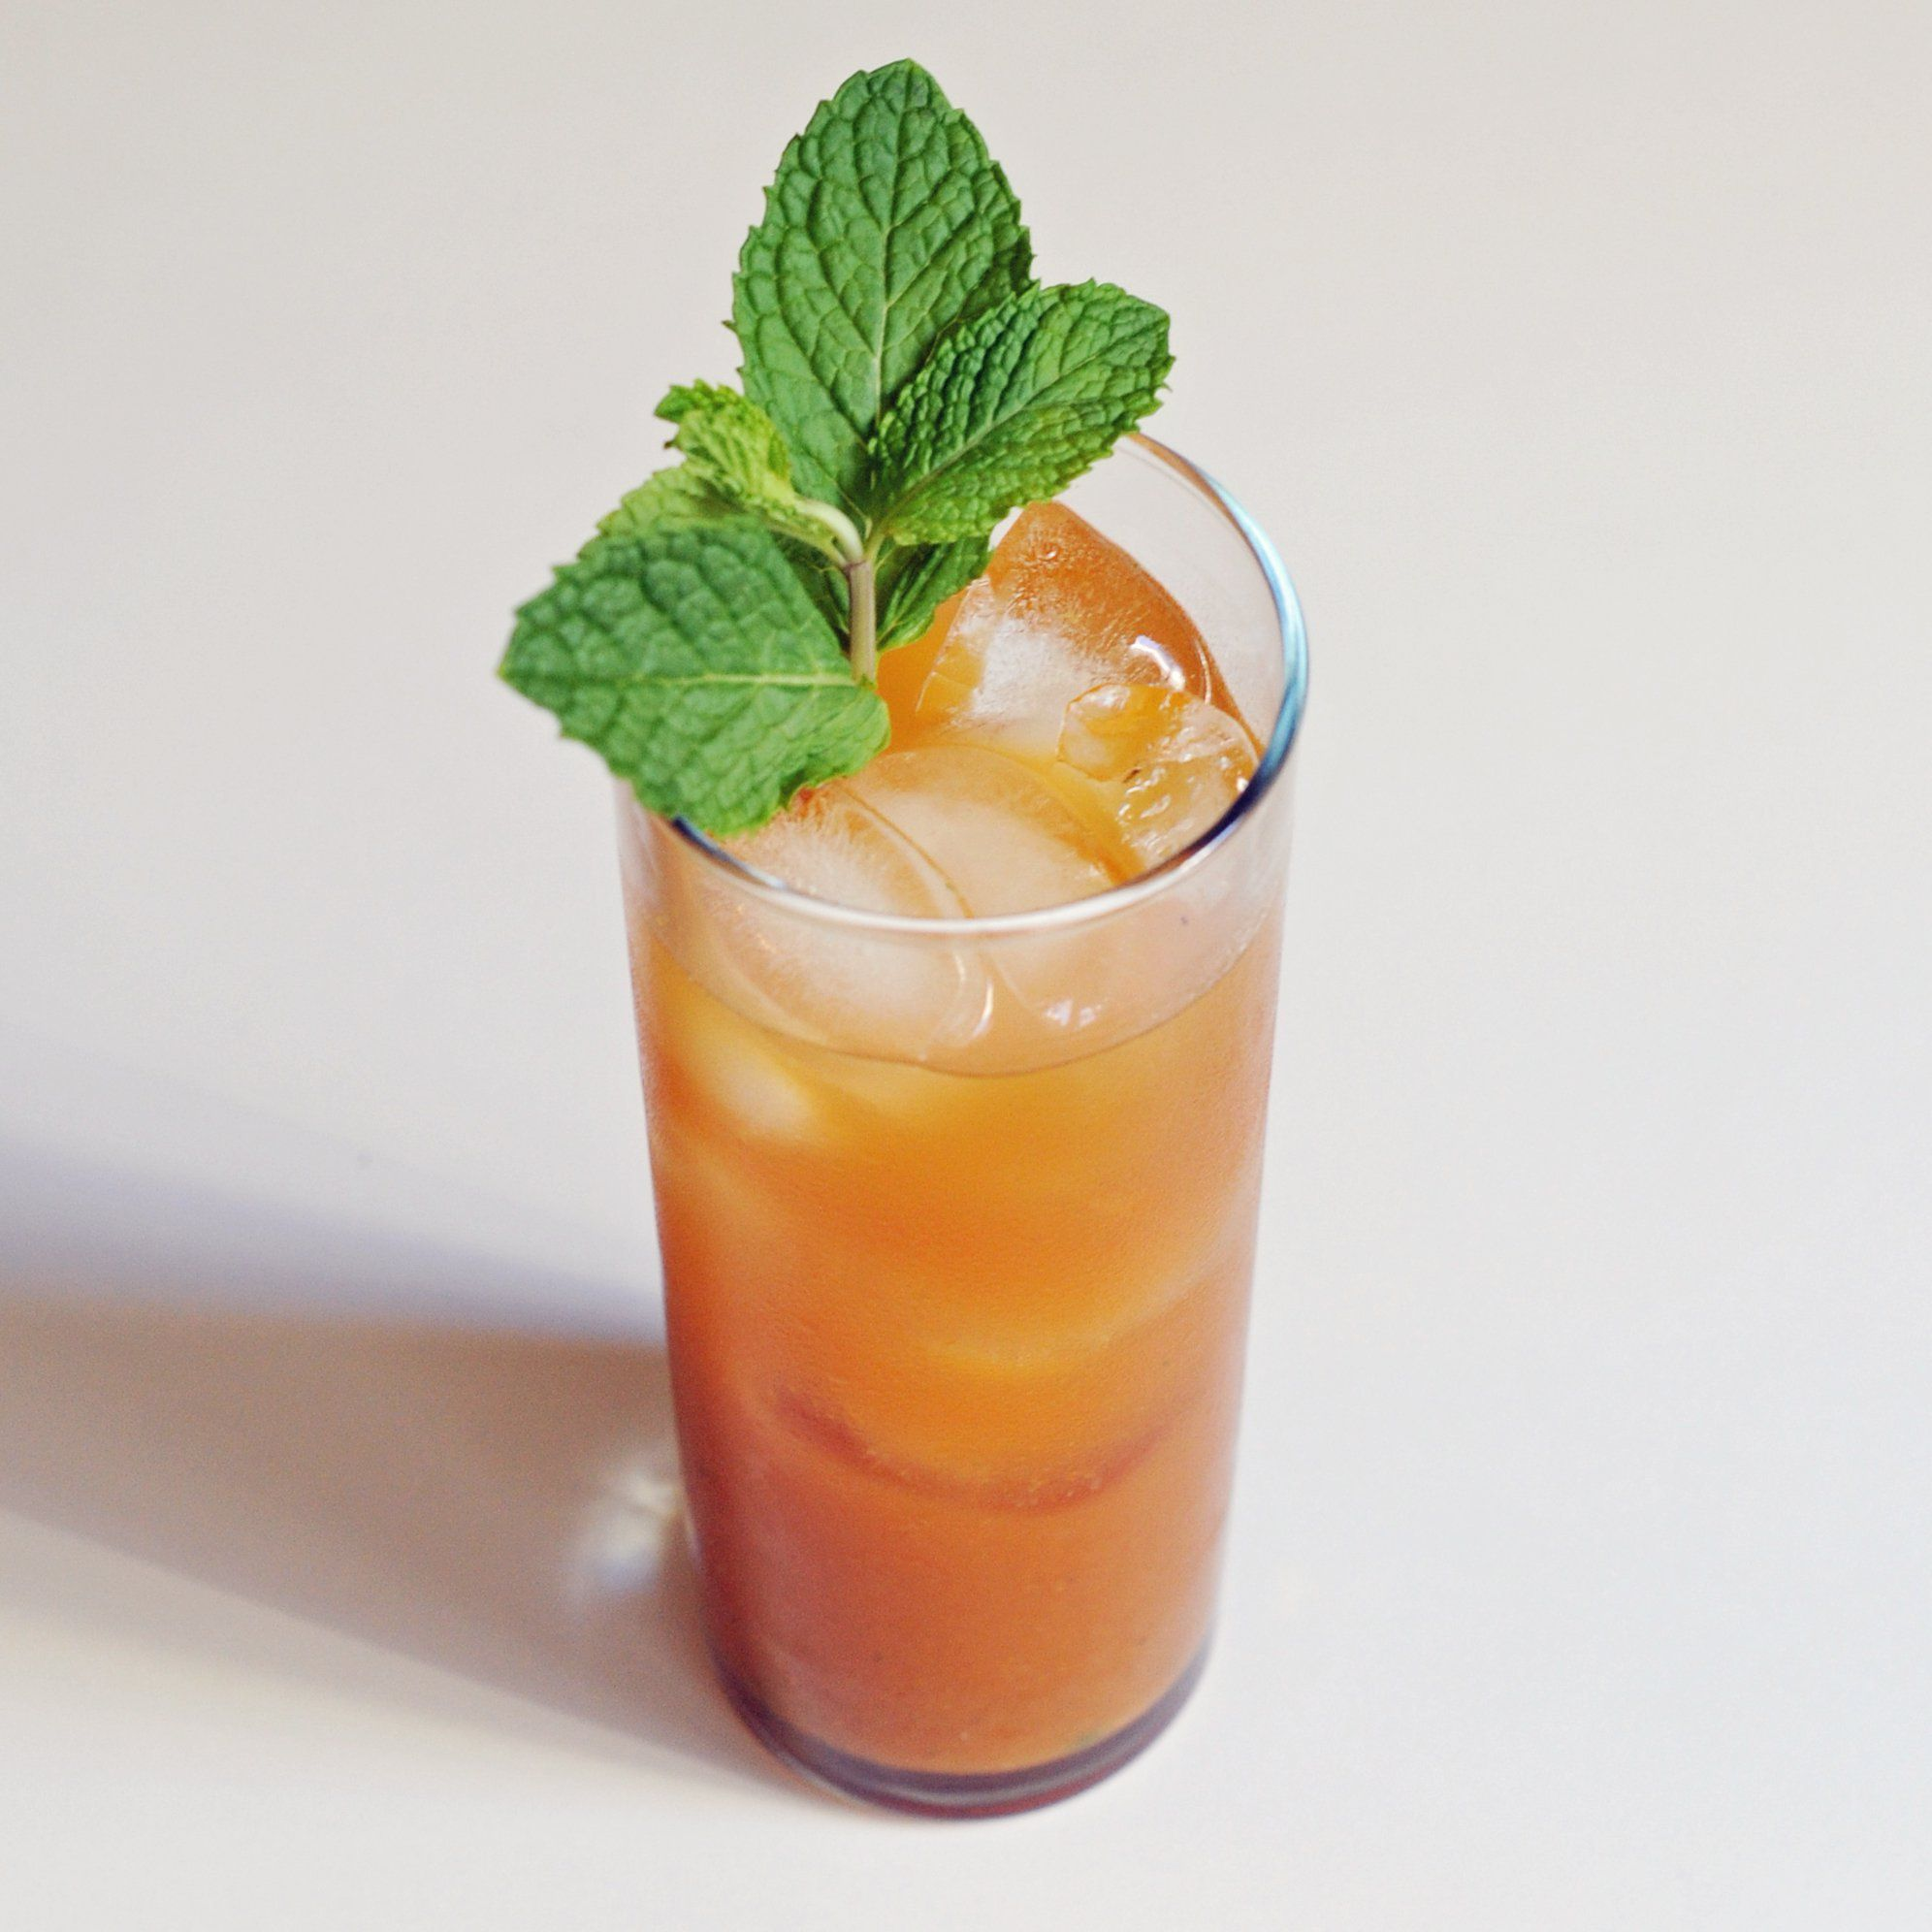 PUMPKIN MOJITOS    ~11 mint leaves  ~1 Tbsp Brown Sugar ~1.25 oz Aged Dark Rum   ~1 Tbsp Pumpkin Puree ~.5 oz Lime Juice (1/2 a Lime) ~2 oz Club Soda >Garnish: Mint sprig